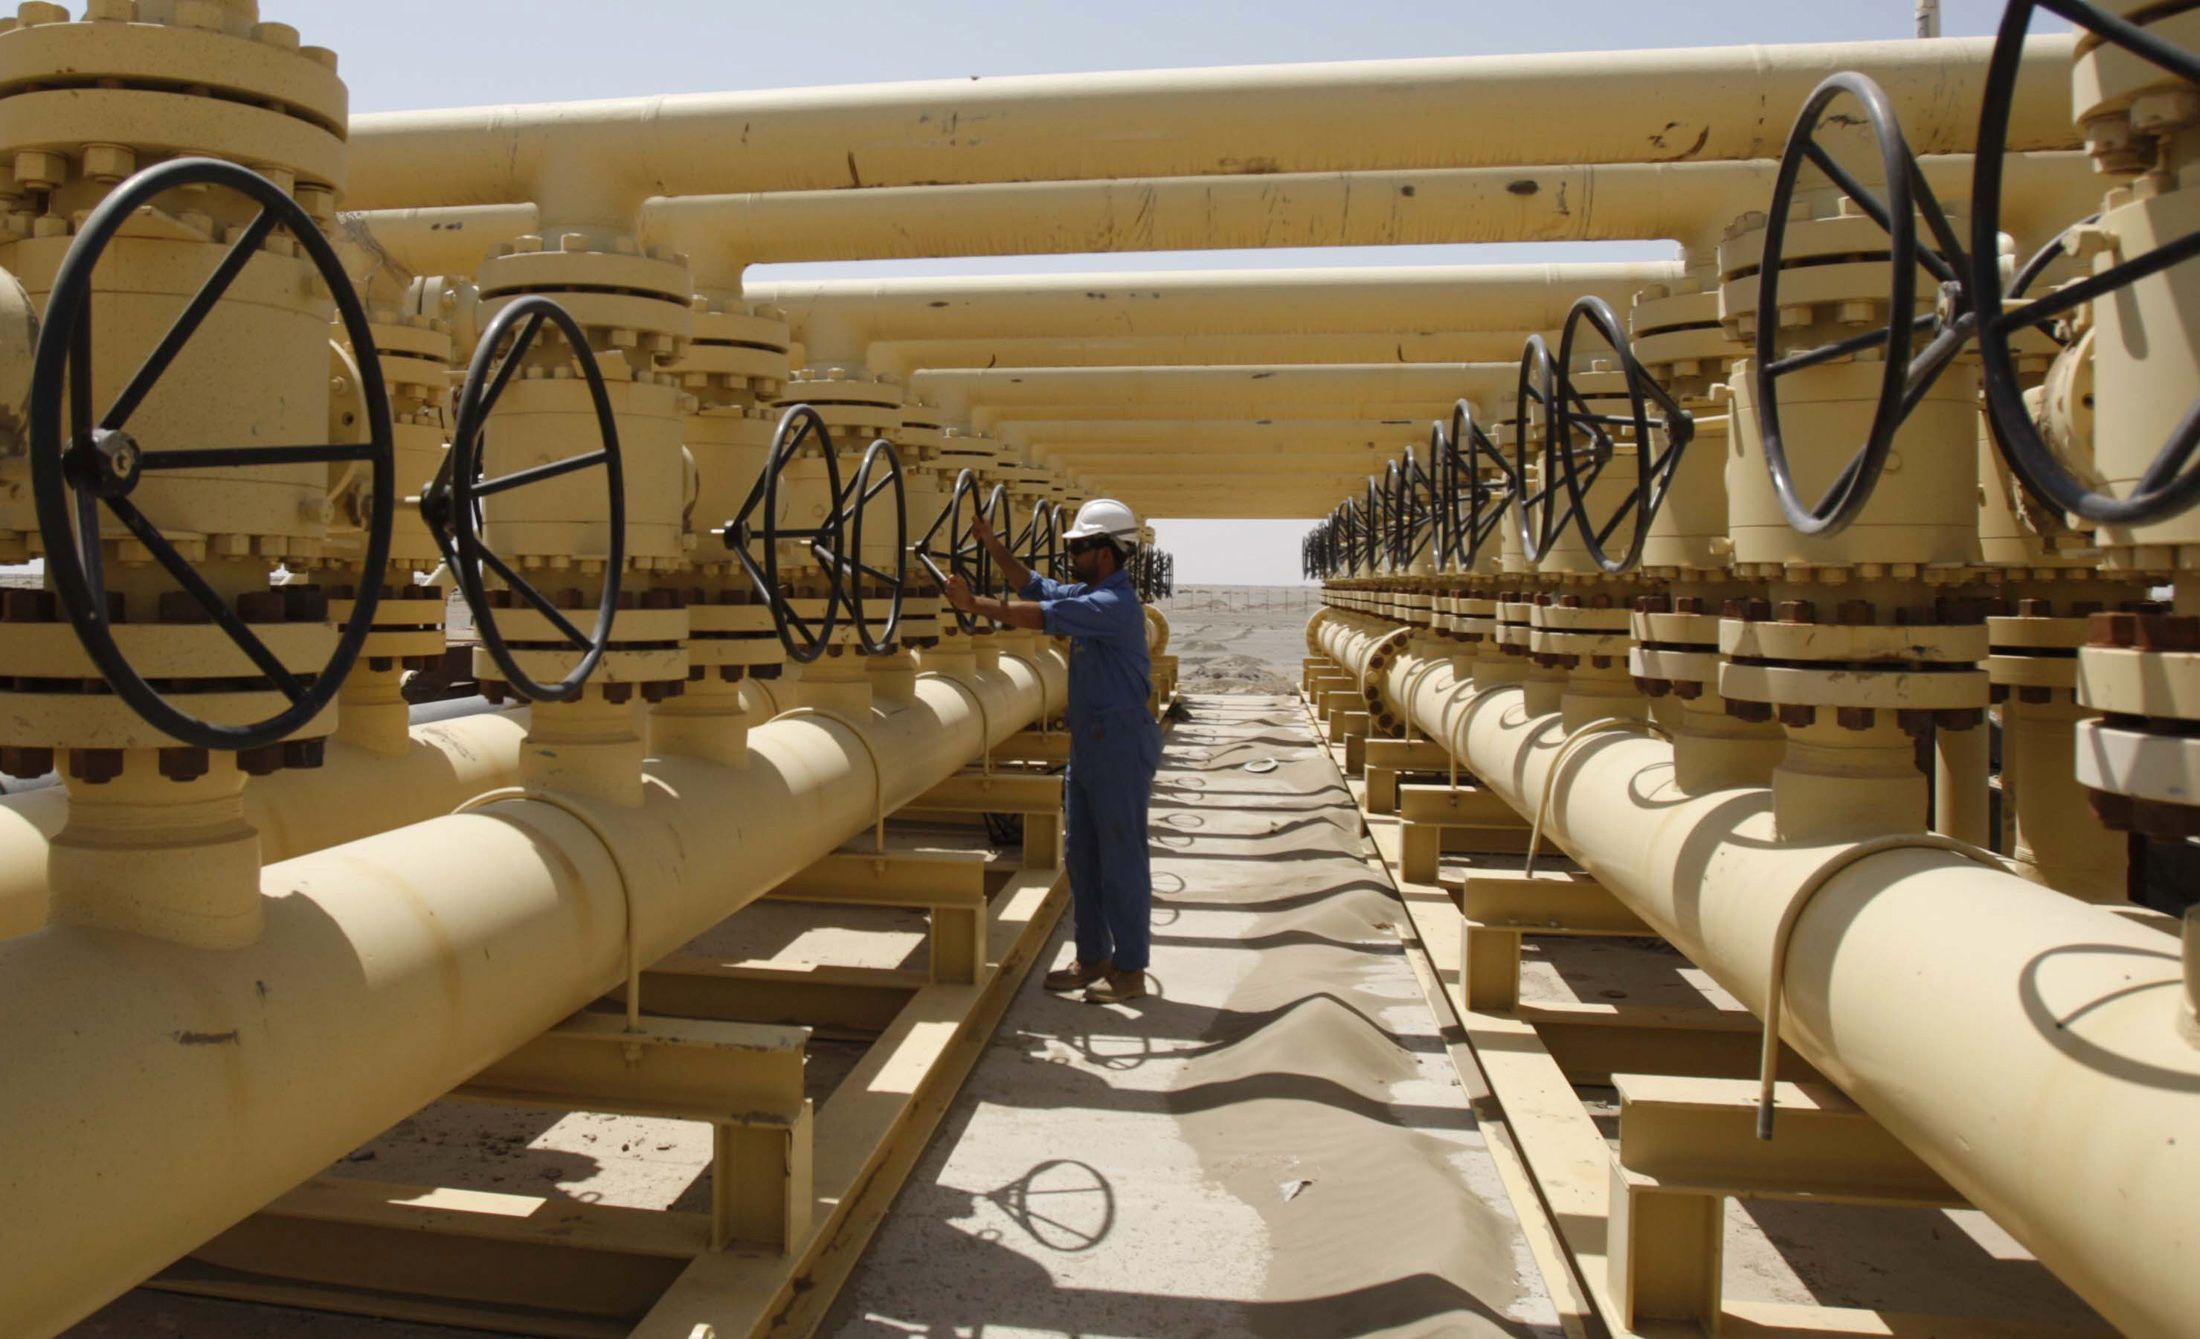 2012-09-11T000000Z_853189695_GM1E89C03NX01_RTRMADP_3_ENERGY-IRAQ-PRODUCTION